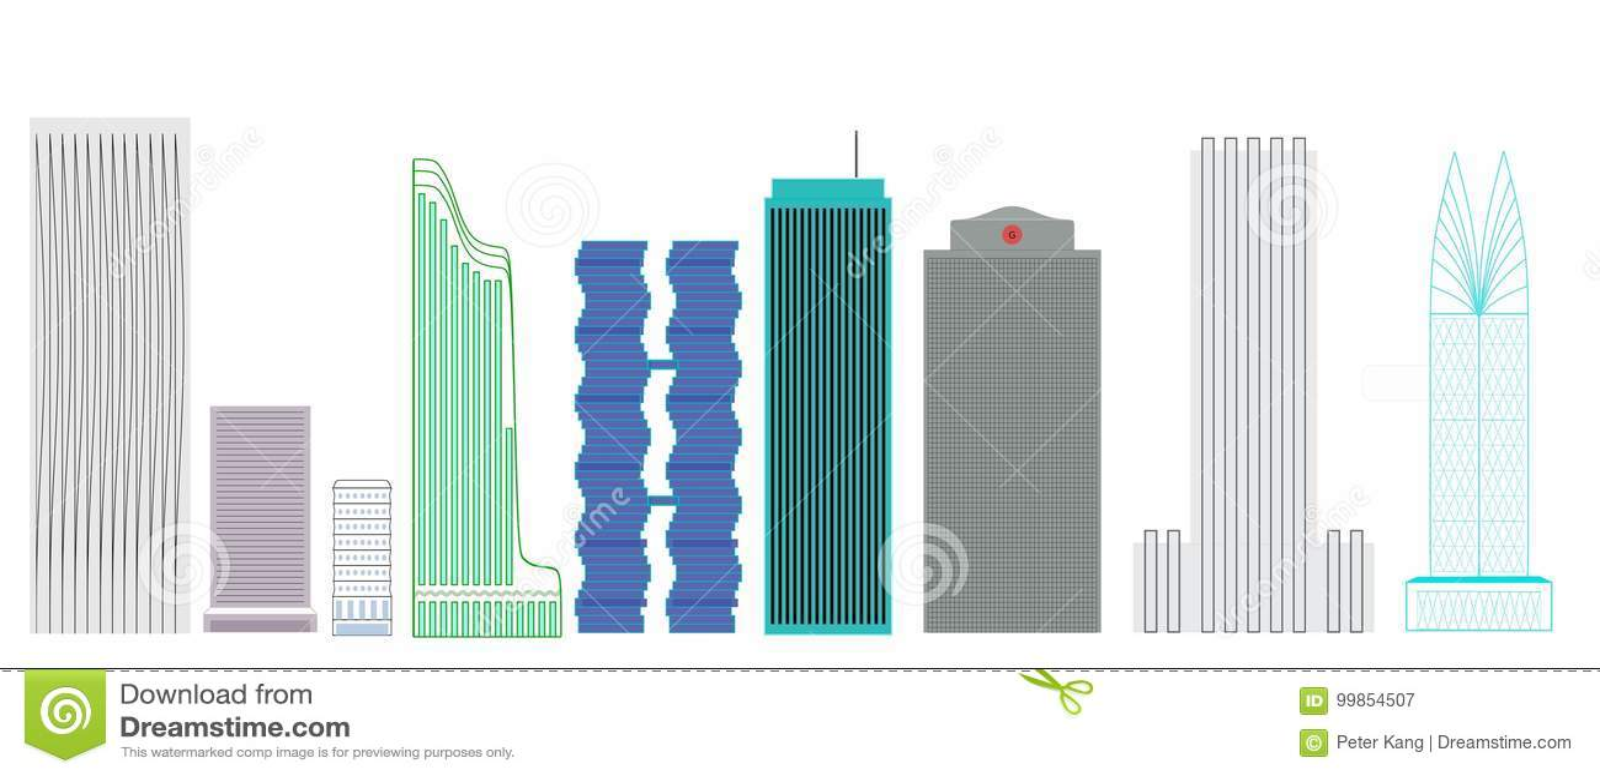 Skyscrapers Designs stock illustration. Illustration of green - 99854507